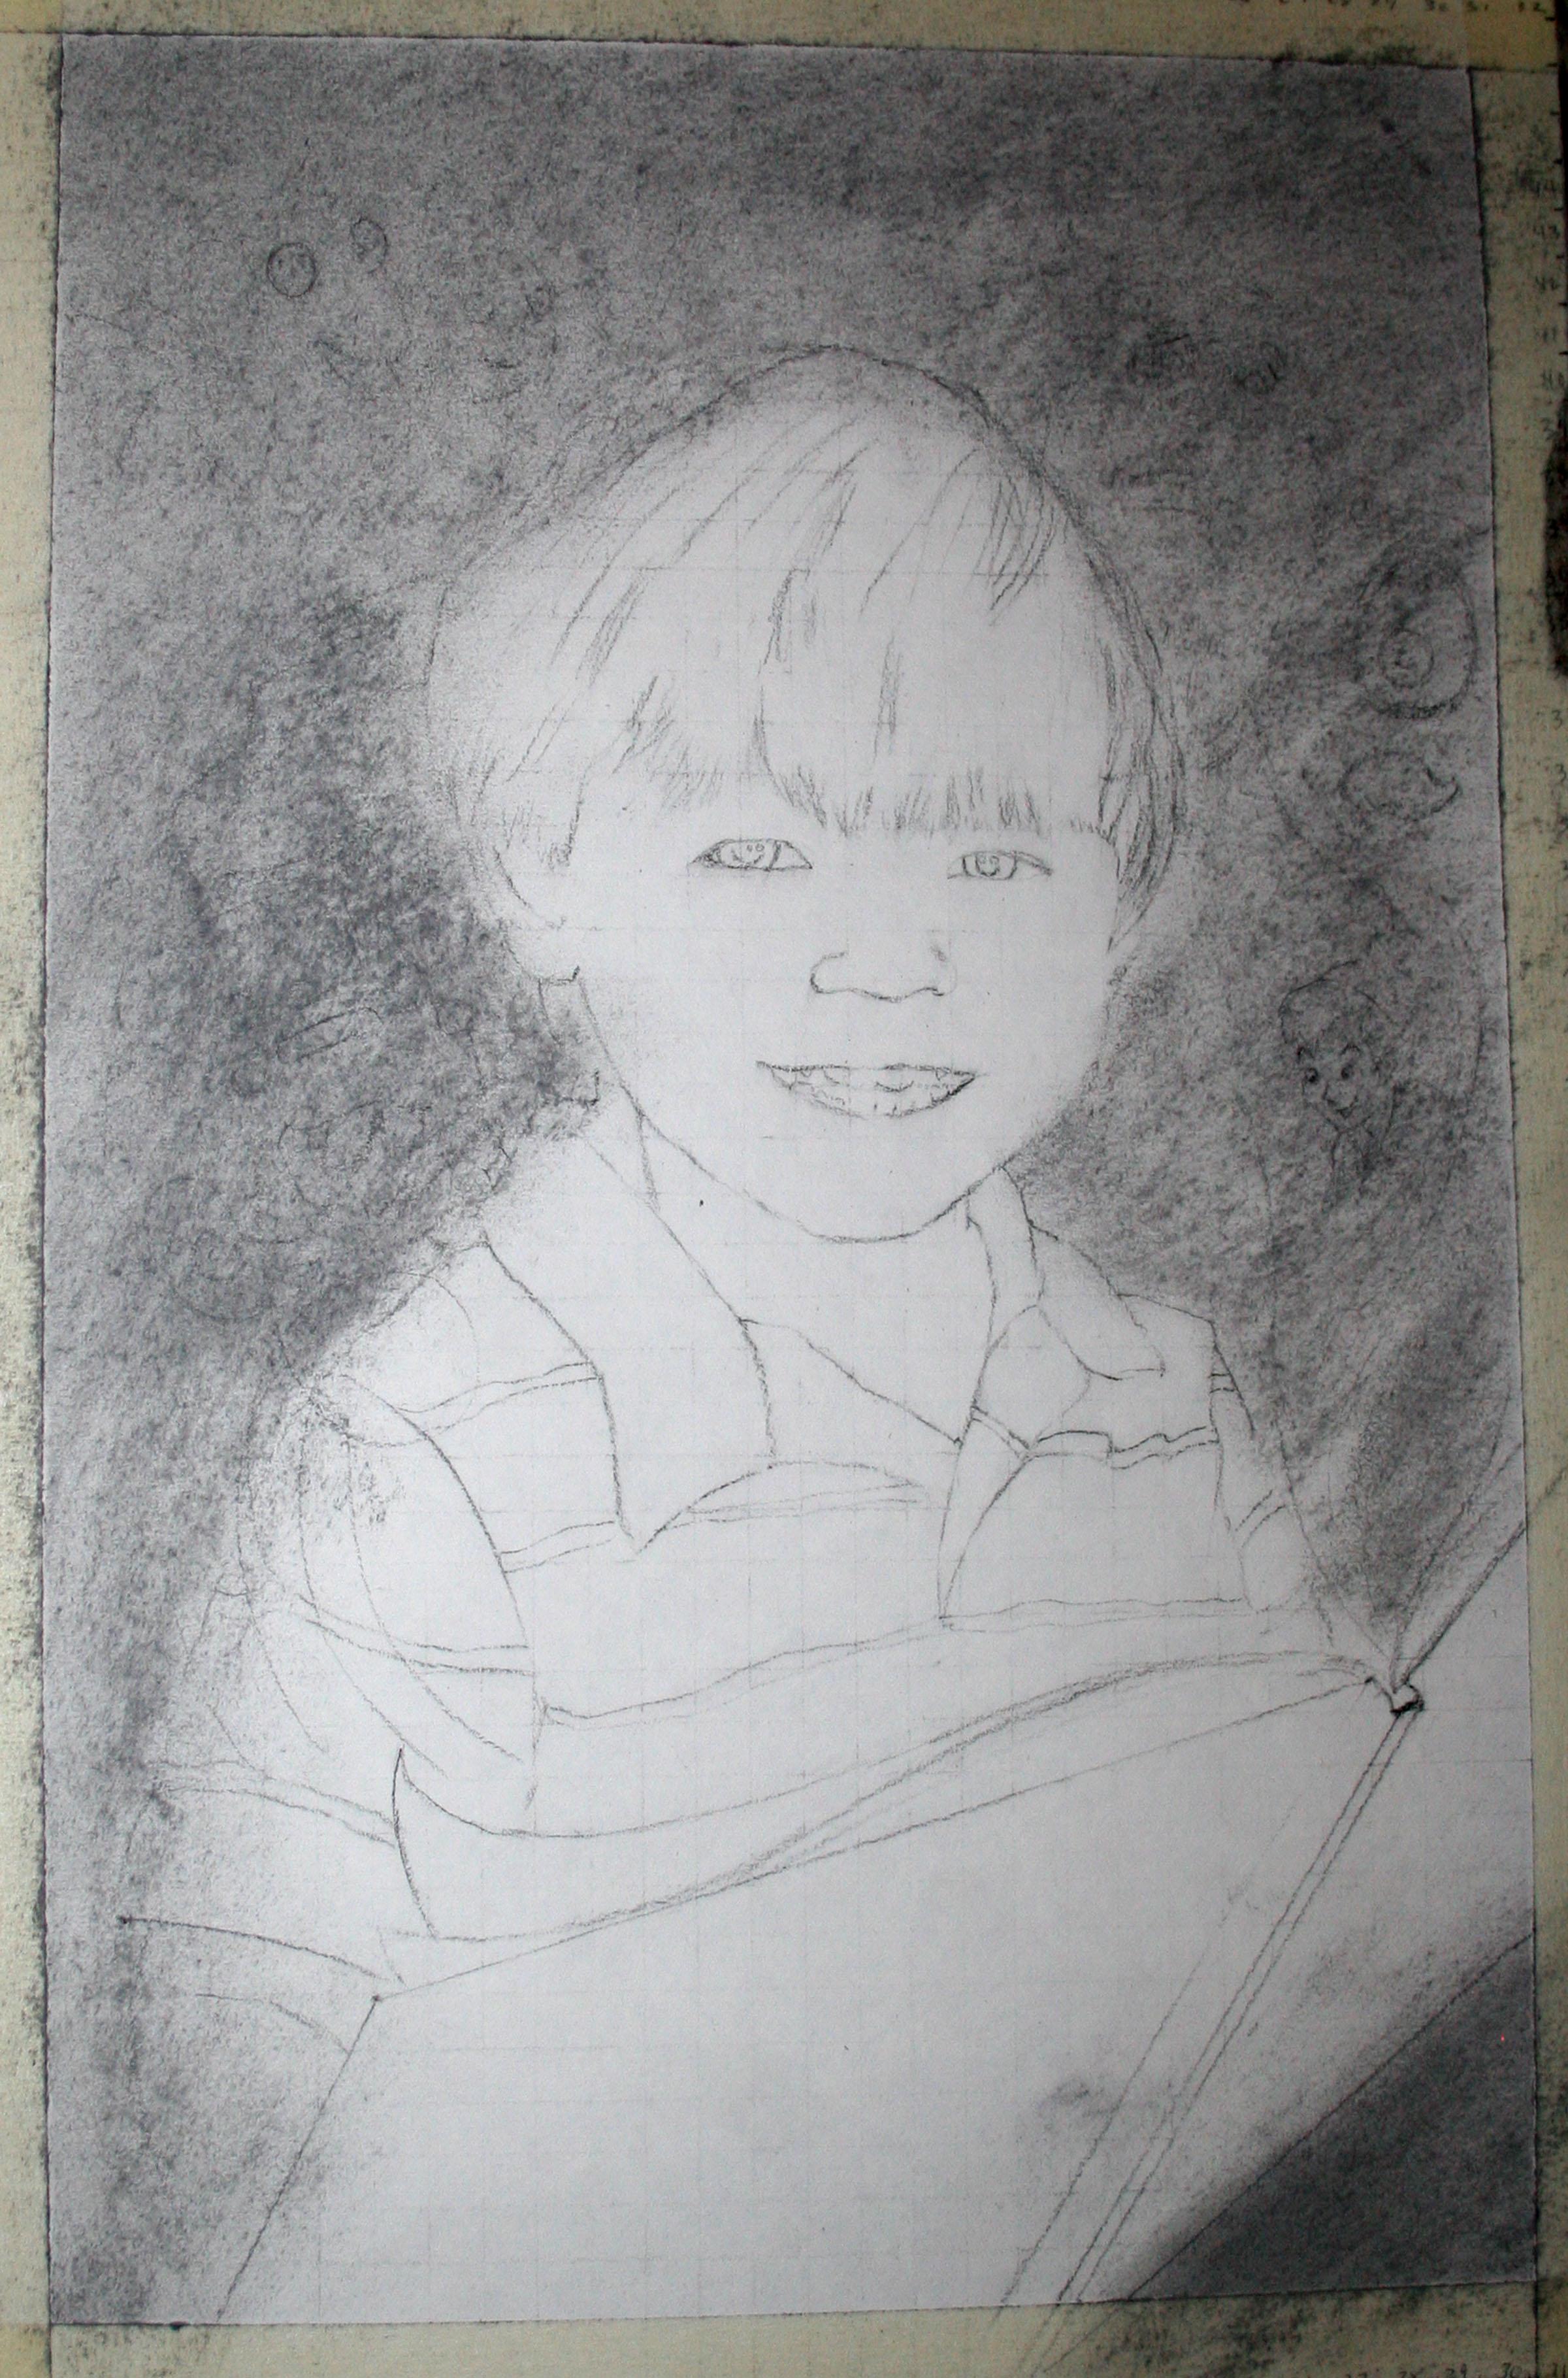 tyler 2 background sketch.jpg